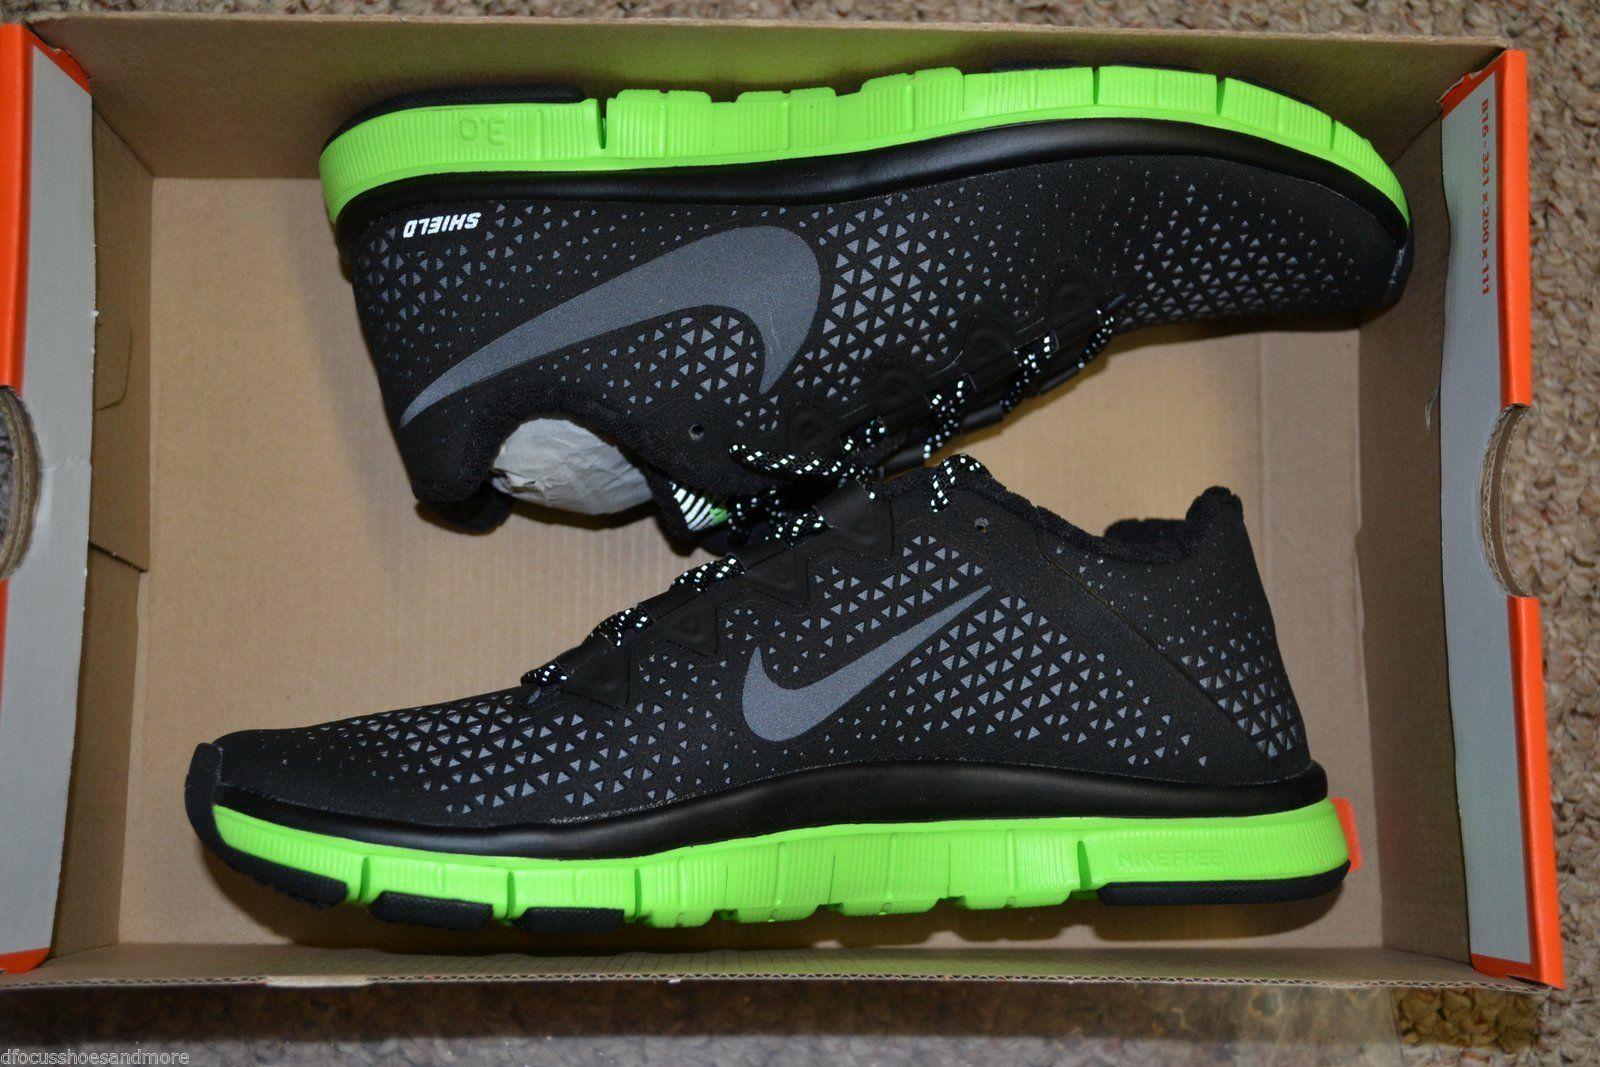 sale retailer 25526 cf7ad Nike Free Haven 3 0 Shield Water Repel Black Green Training Shoes 537773 Sz  6 5  eBay